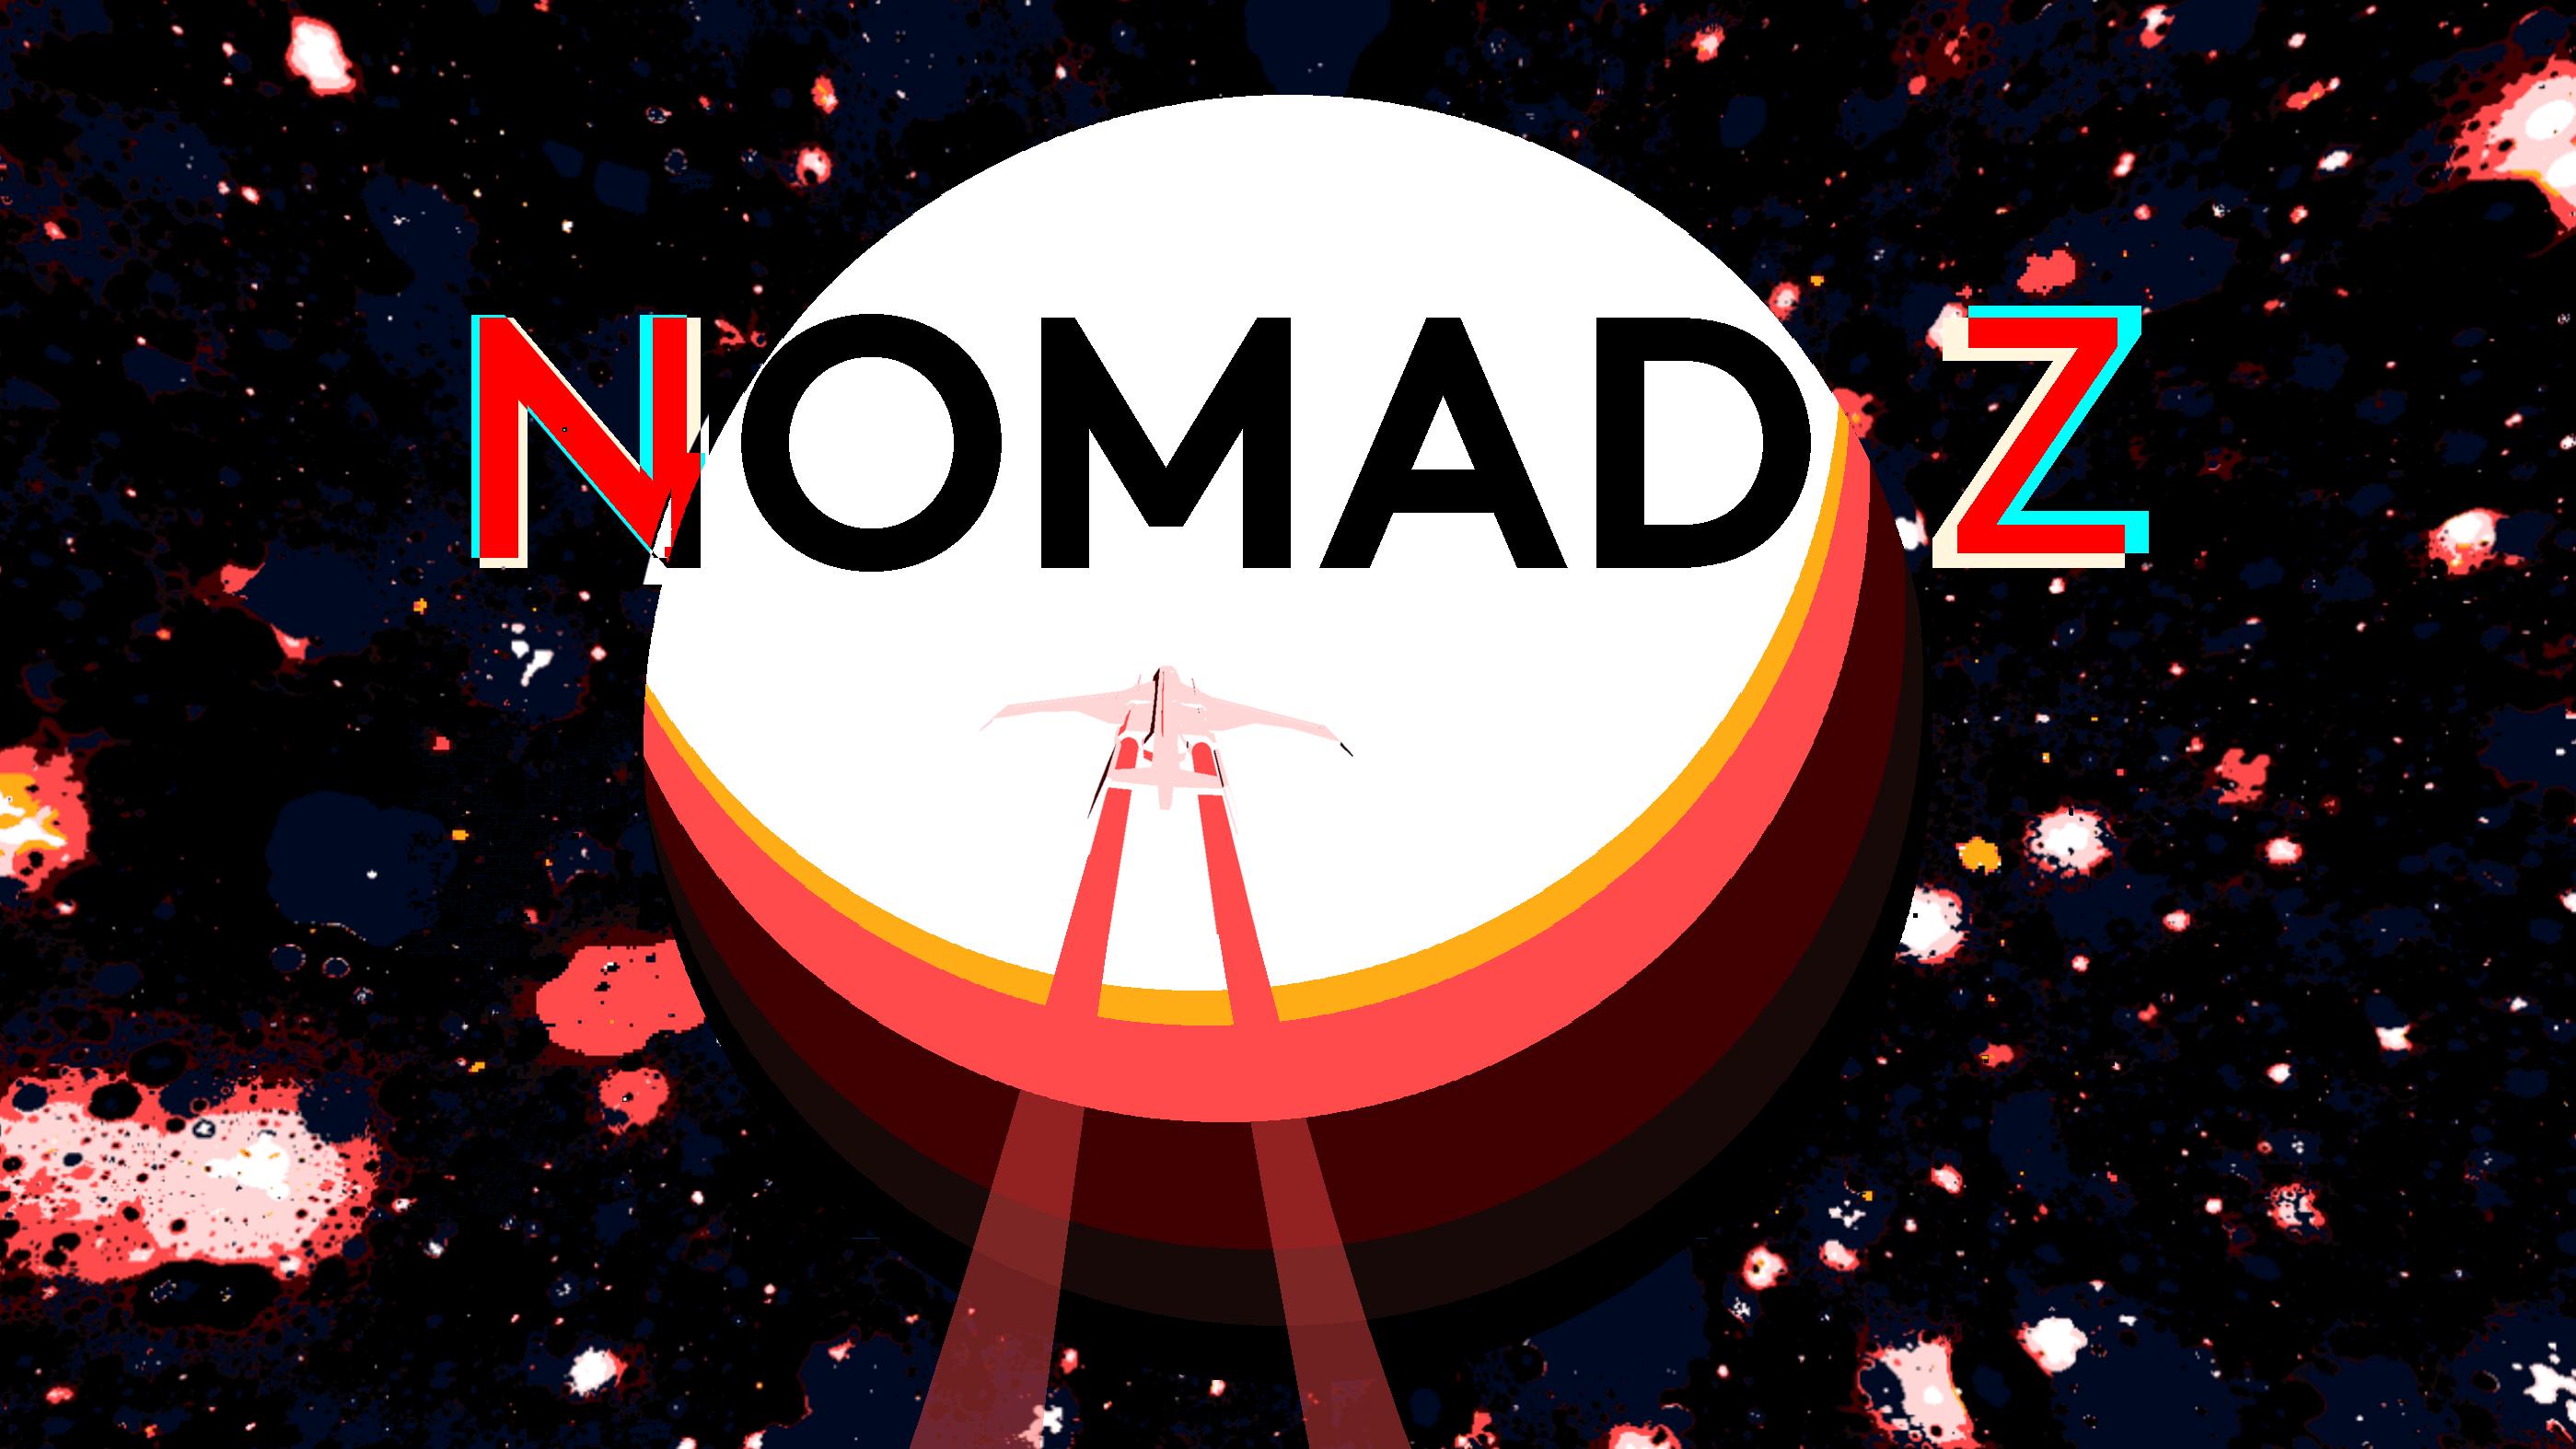 Nomad Z